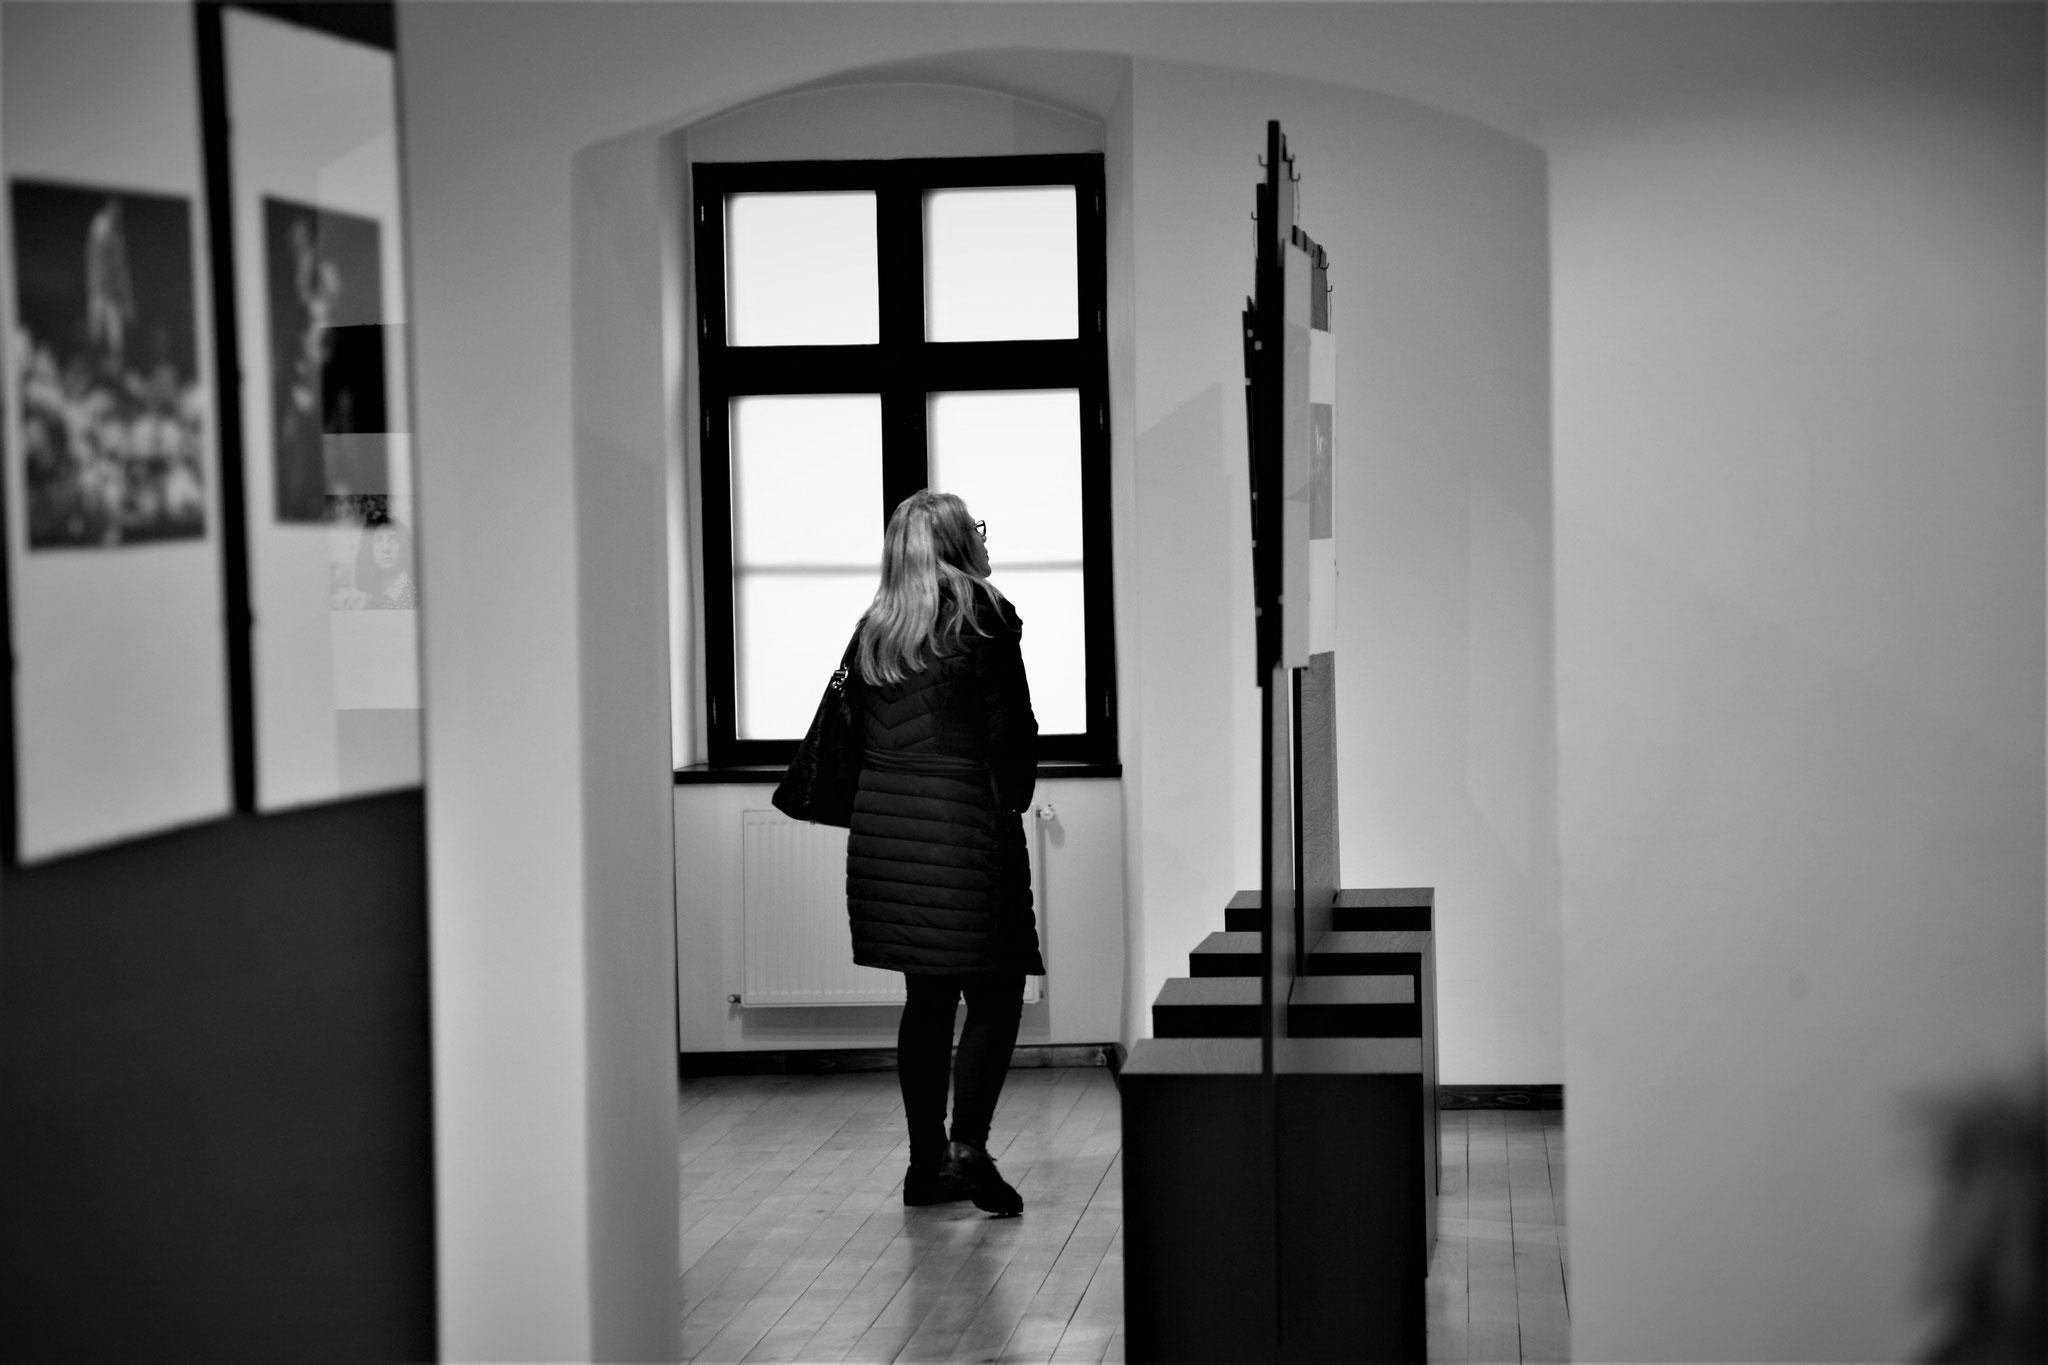 Foto: Illés Emeric Imre